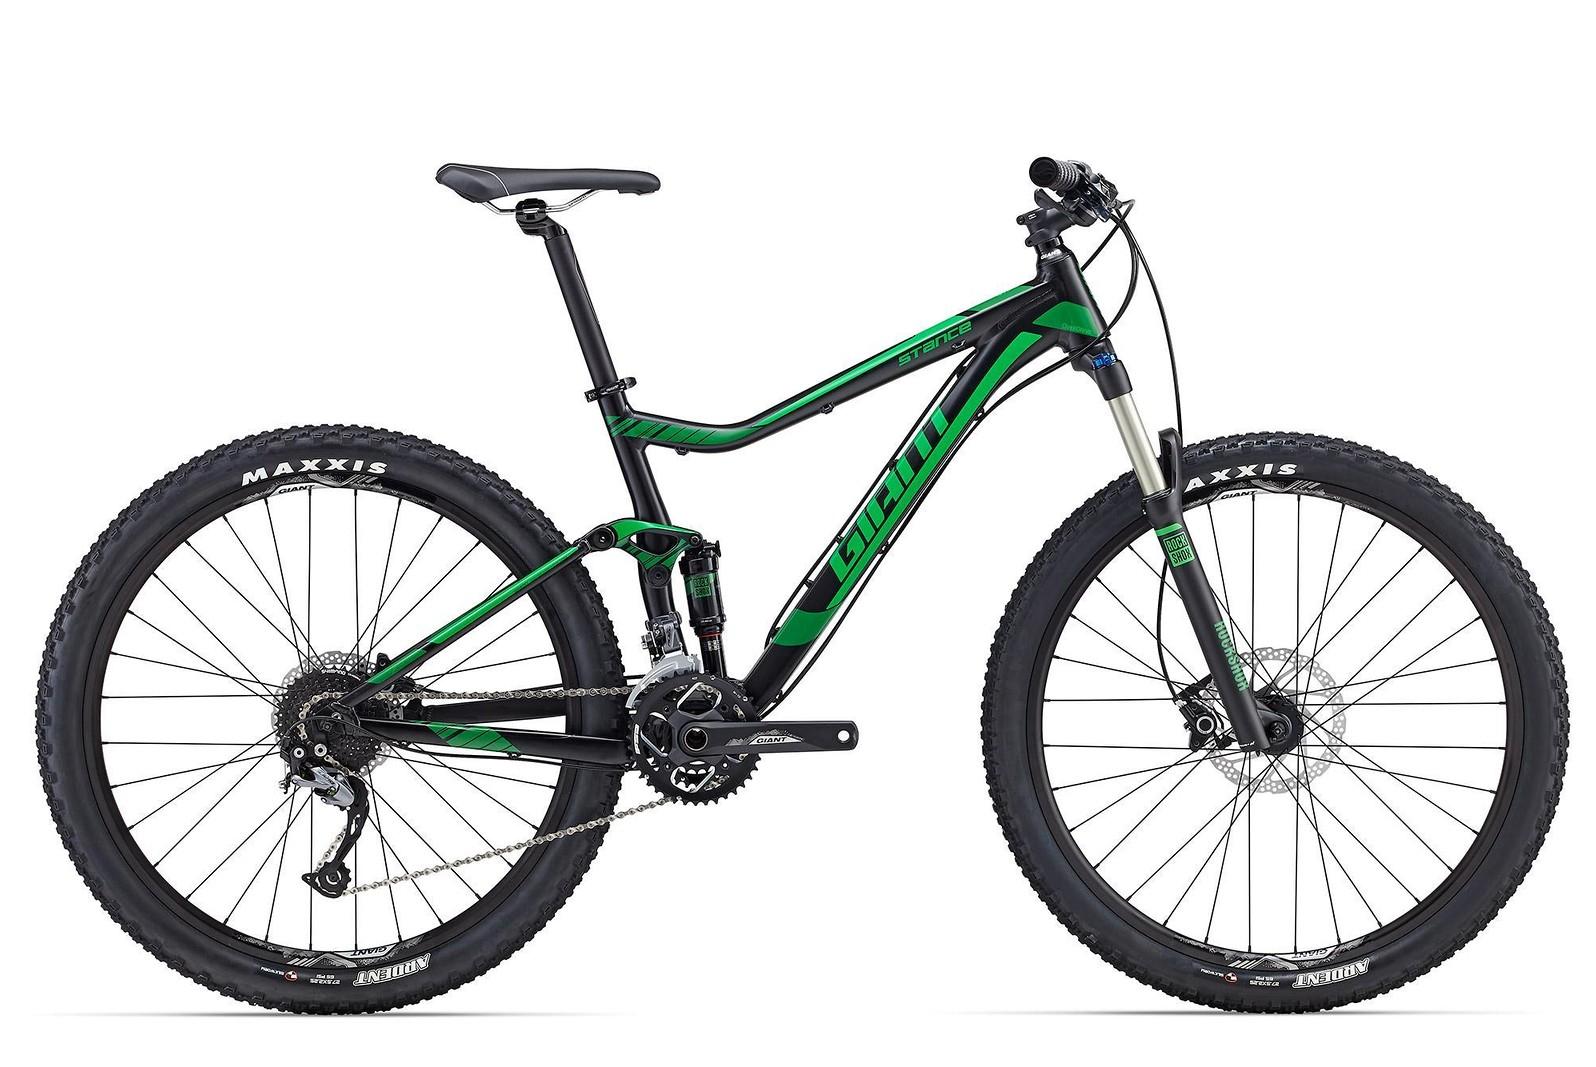 2016 Giant Stance 27.5 2 Bike Stance-275-2-Black